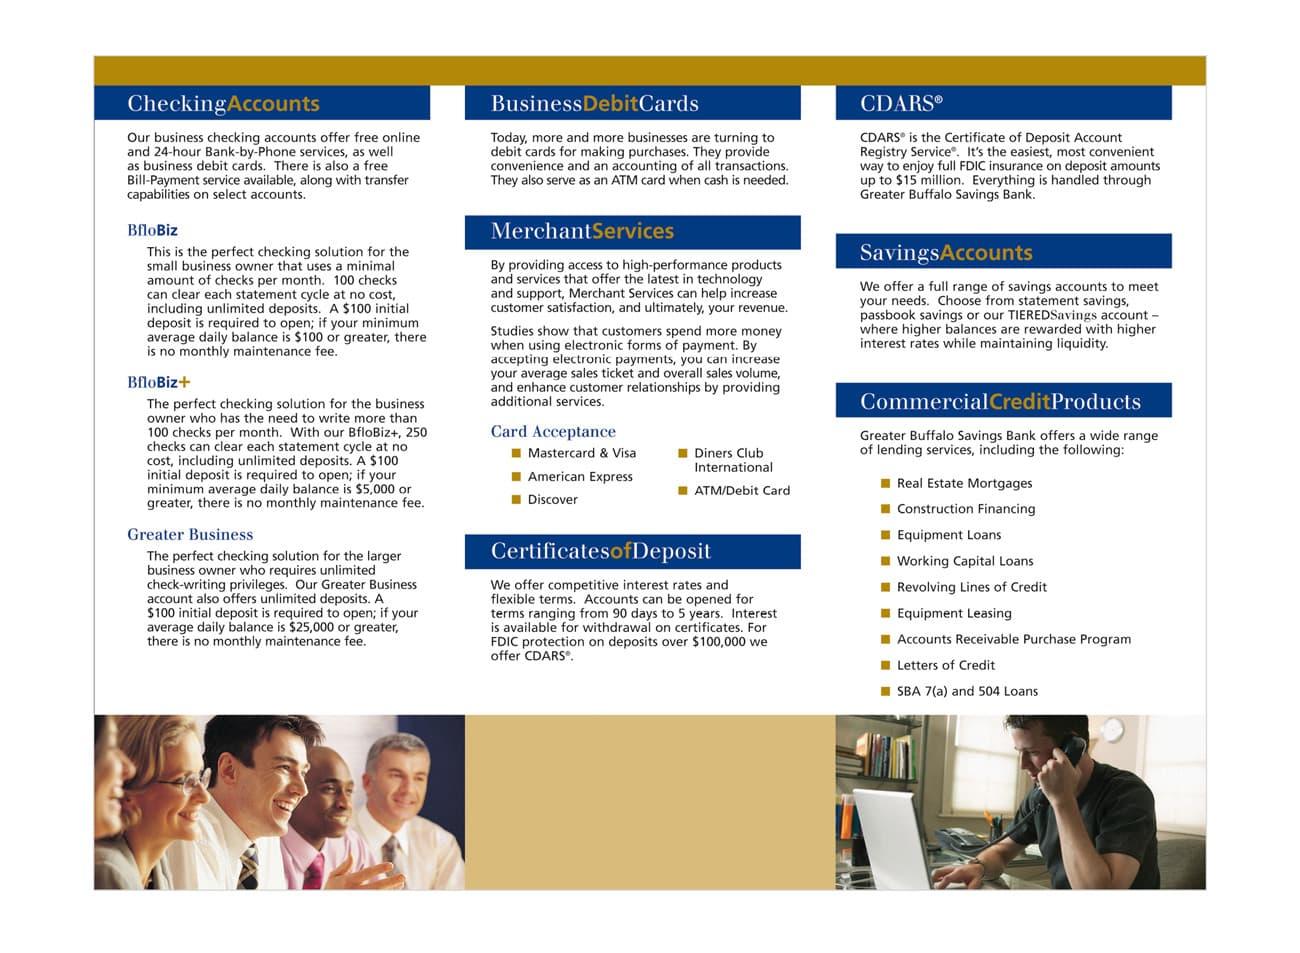 Greater buffalo savings bank our work middleweight marketing greater buffalo savings bank work middleweight marketing buffalo ny xflitez Image collections